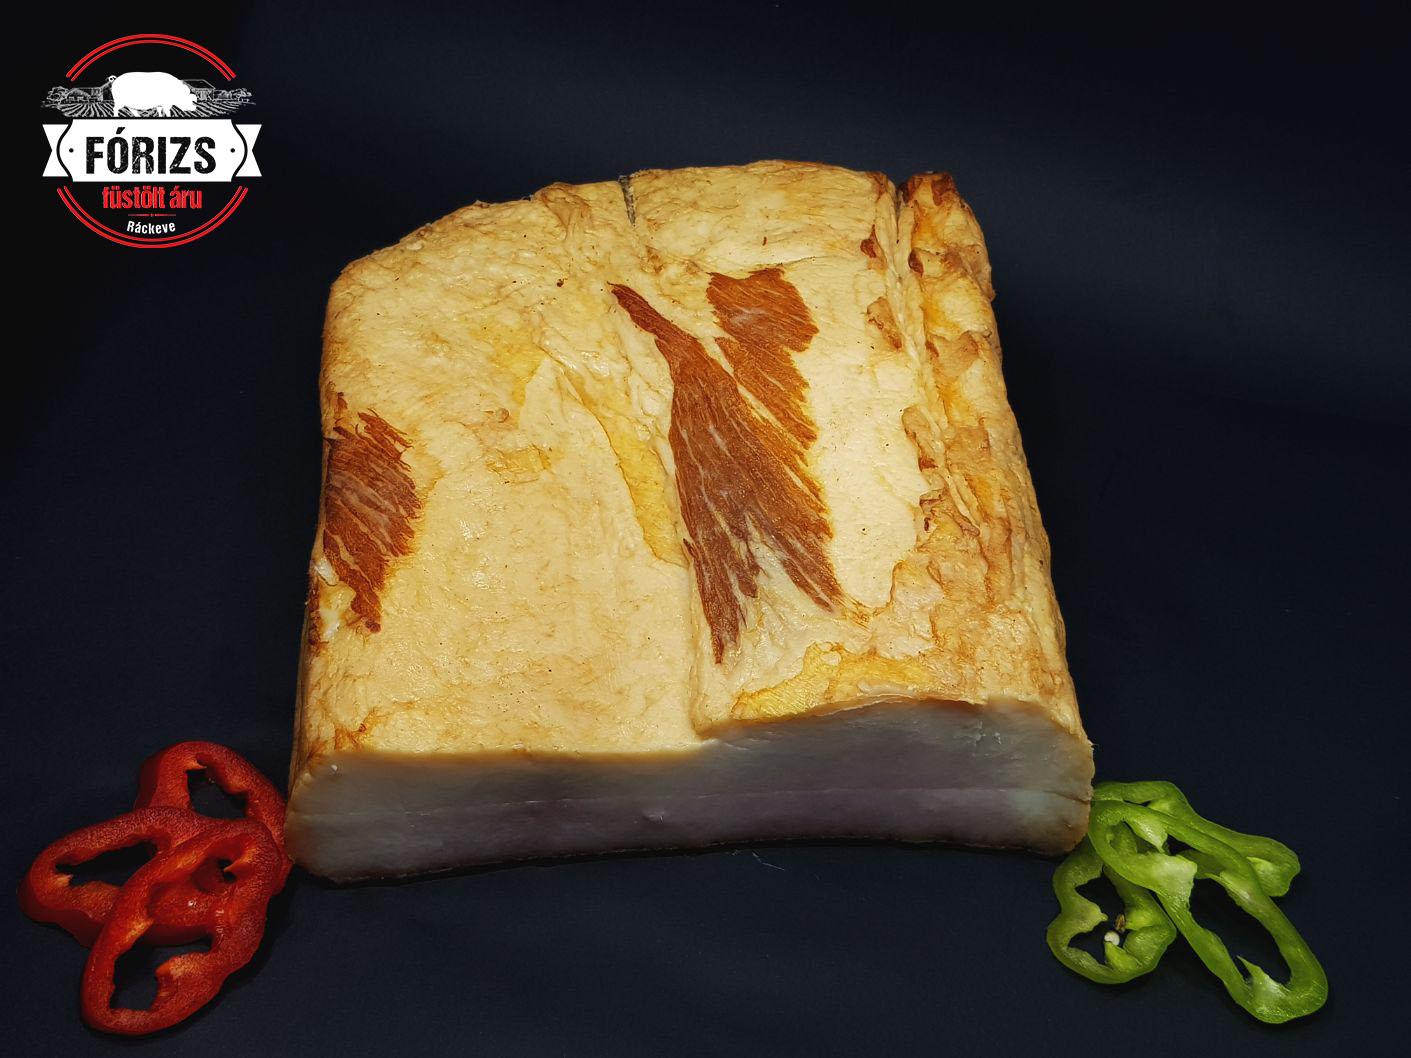 fustolt-kenyer-szalonna-rendeles-rackeve-forizs-fustoltaru-hus